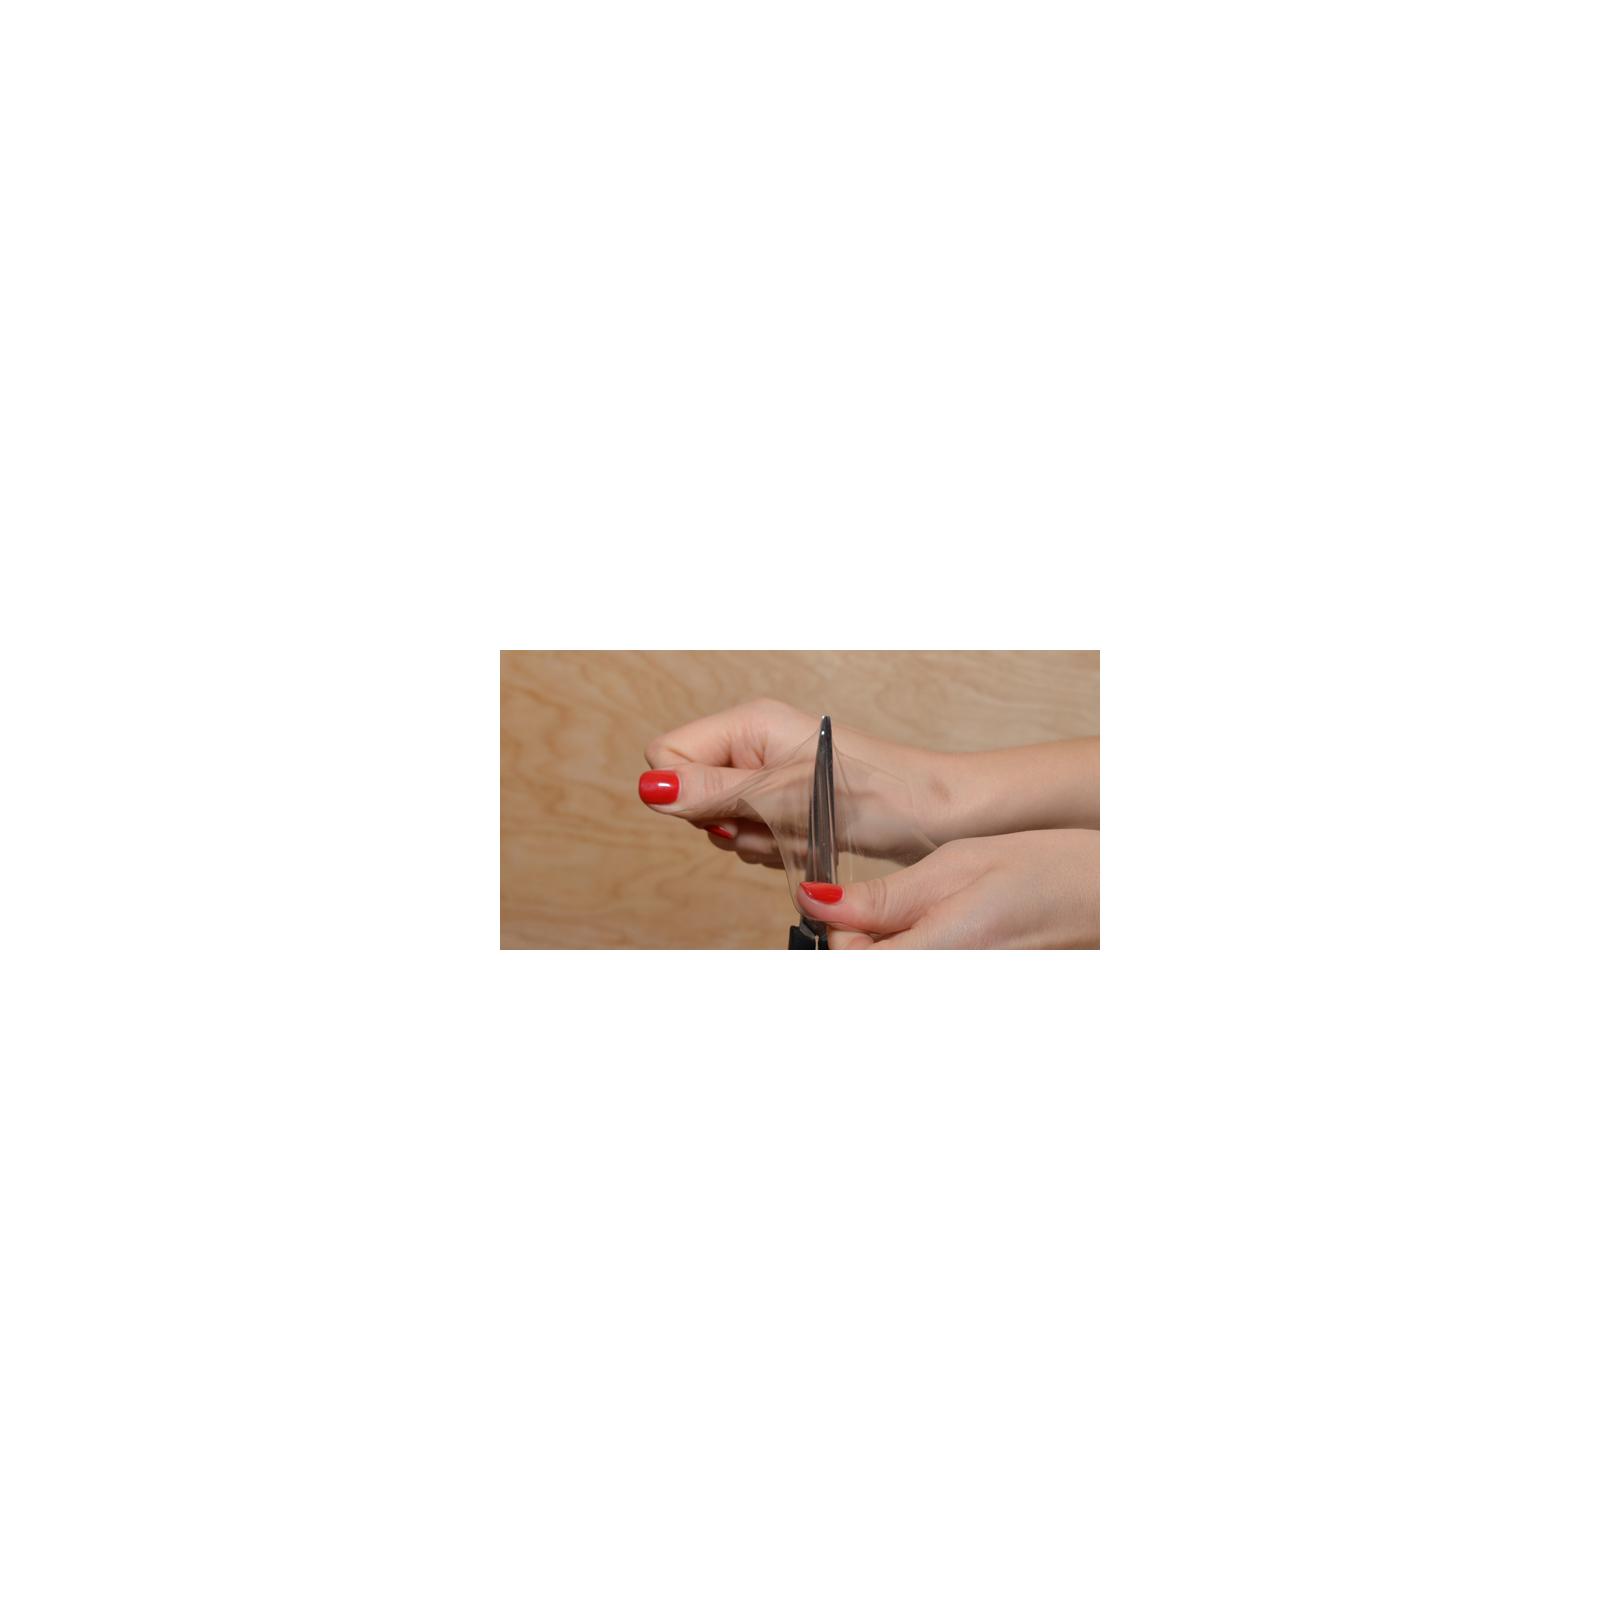 Пленка защитная JINN ультрапрочная Magic Screen для Alcatel Onetouch Scribe HD 80 (Alcatel Onetouch Scribe HD front+back) изображение 4